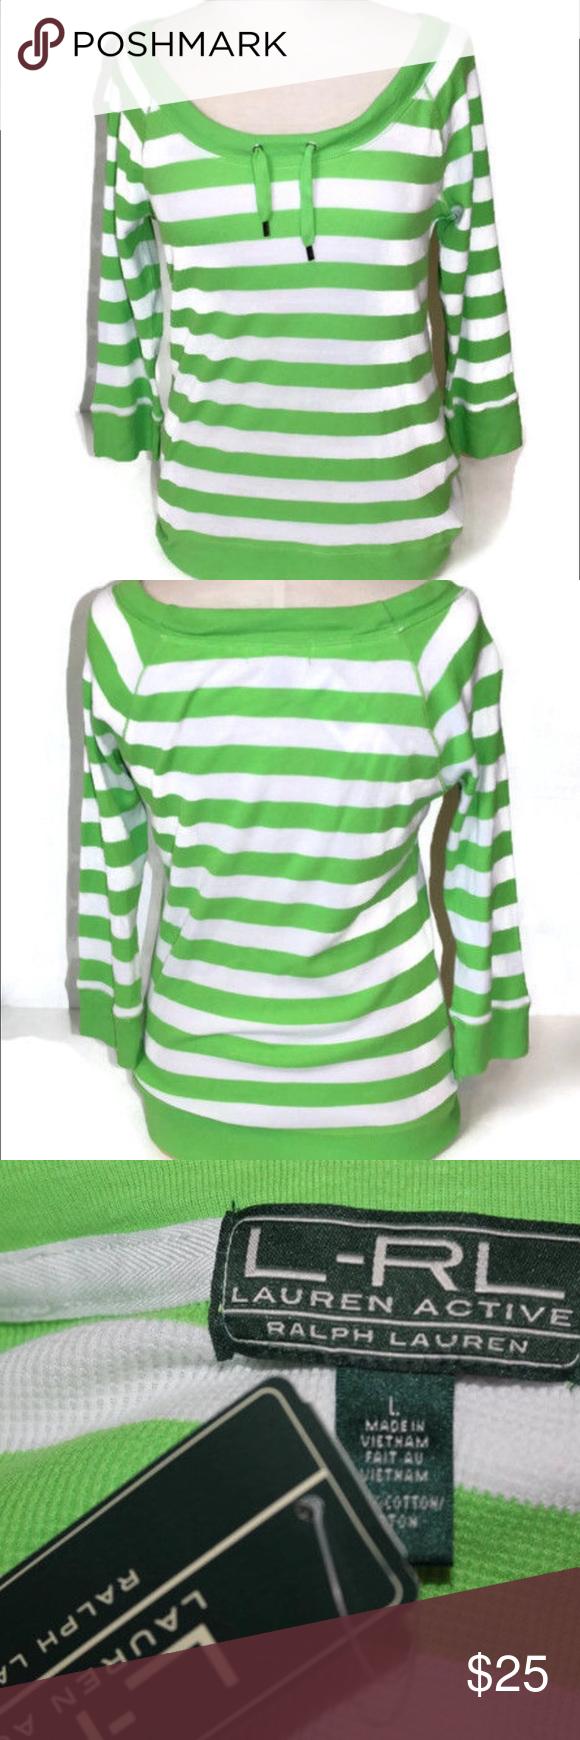 "LRL Active Ralph Lauren Striped 3/4 Sleeve Shirt LRL Active Scoop Neck top. Raglan cut sleeves. 100% Cotton. New with tags! Bust measures 19"" flat across front. Shirt measures 25"" in length from collar to bottom hem. Lauren Ralph Lauren Tops Tees - Short Sleeve"